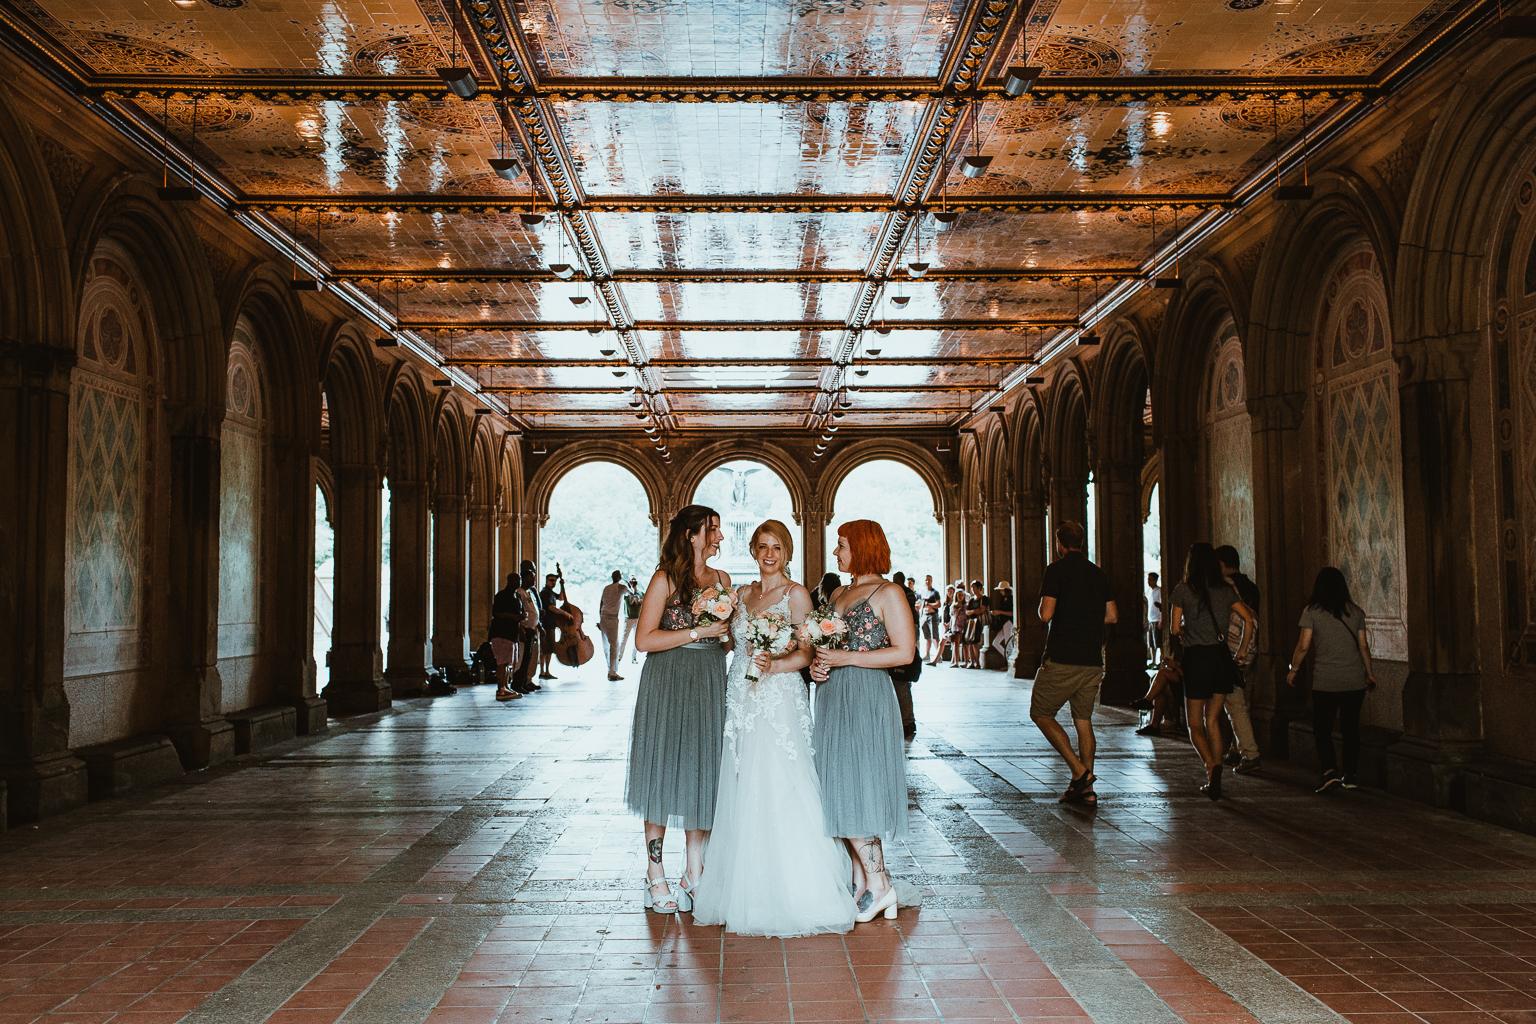 New York Manhattan Central Park Wedding Photographer-122.jpg